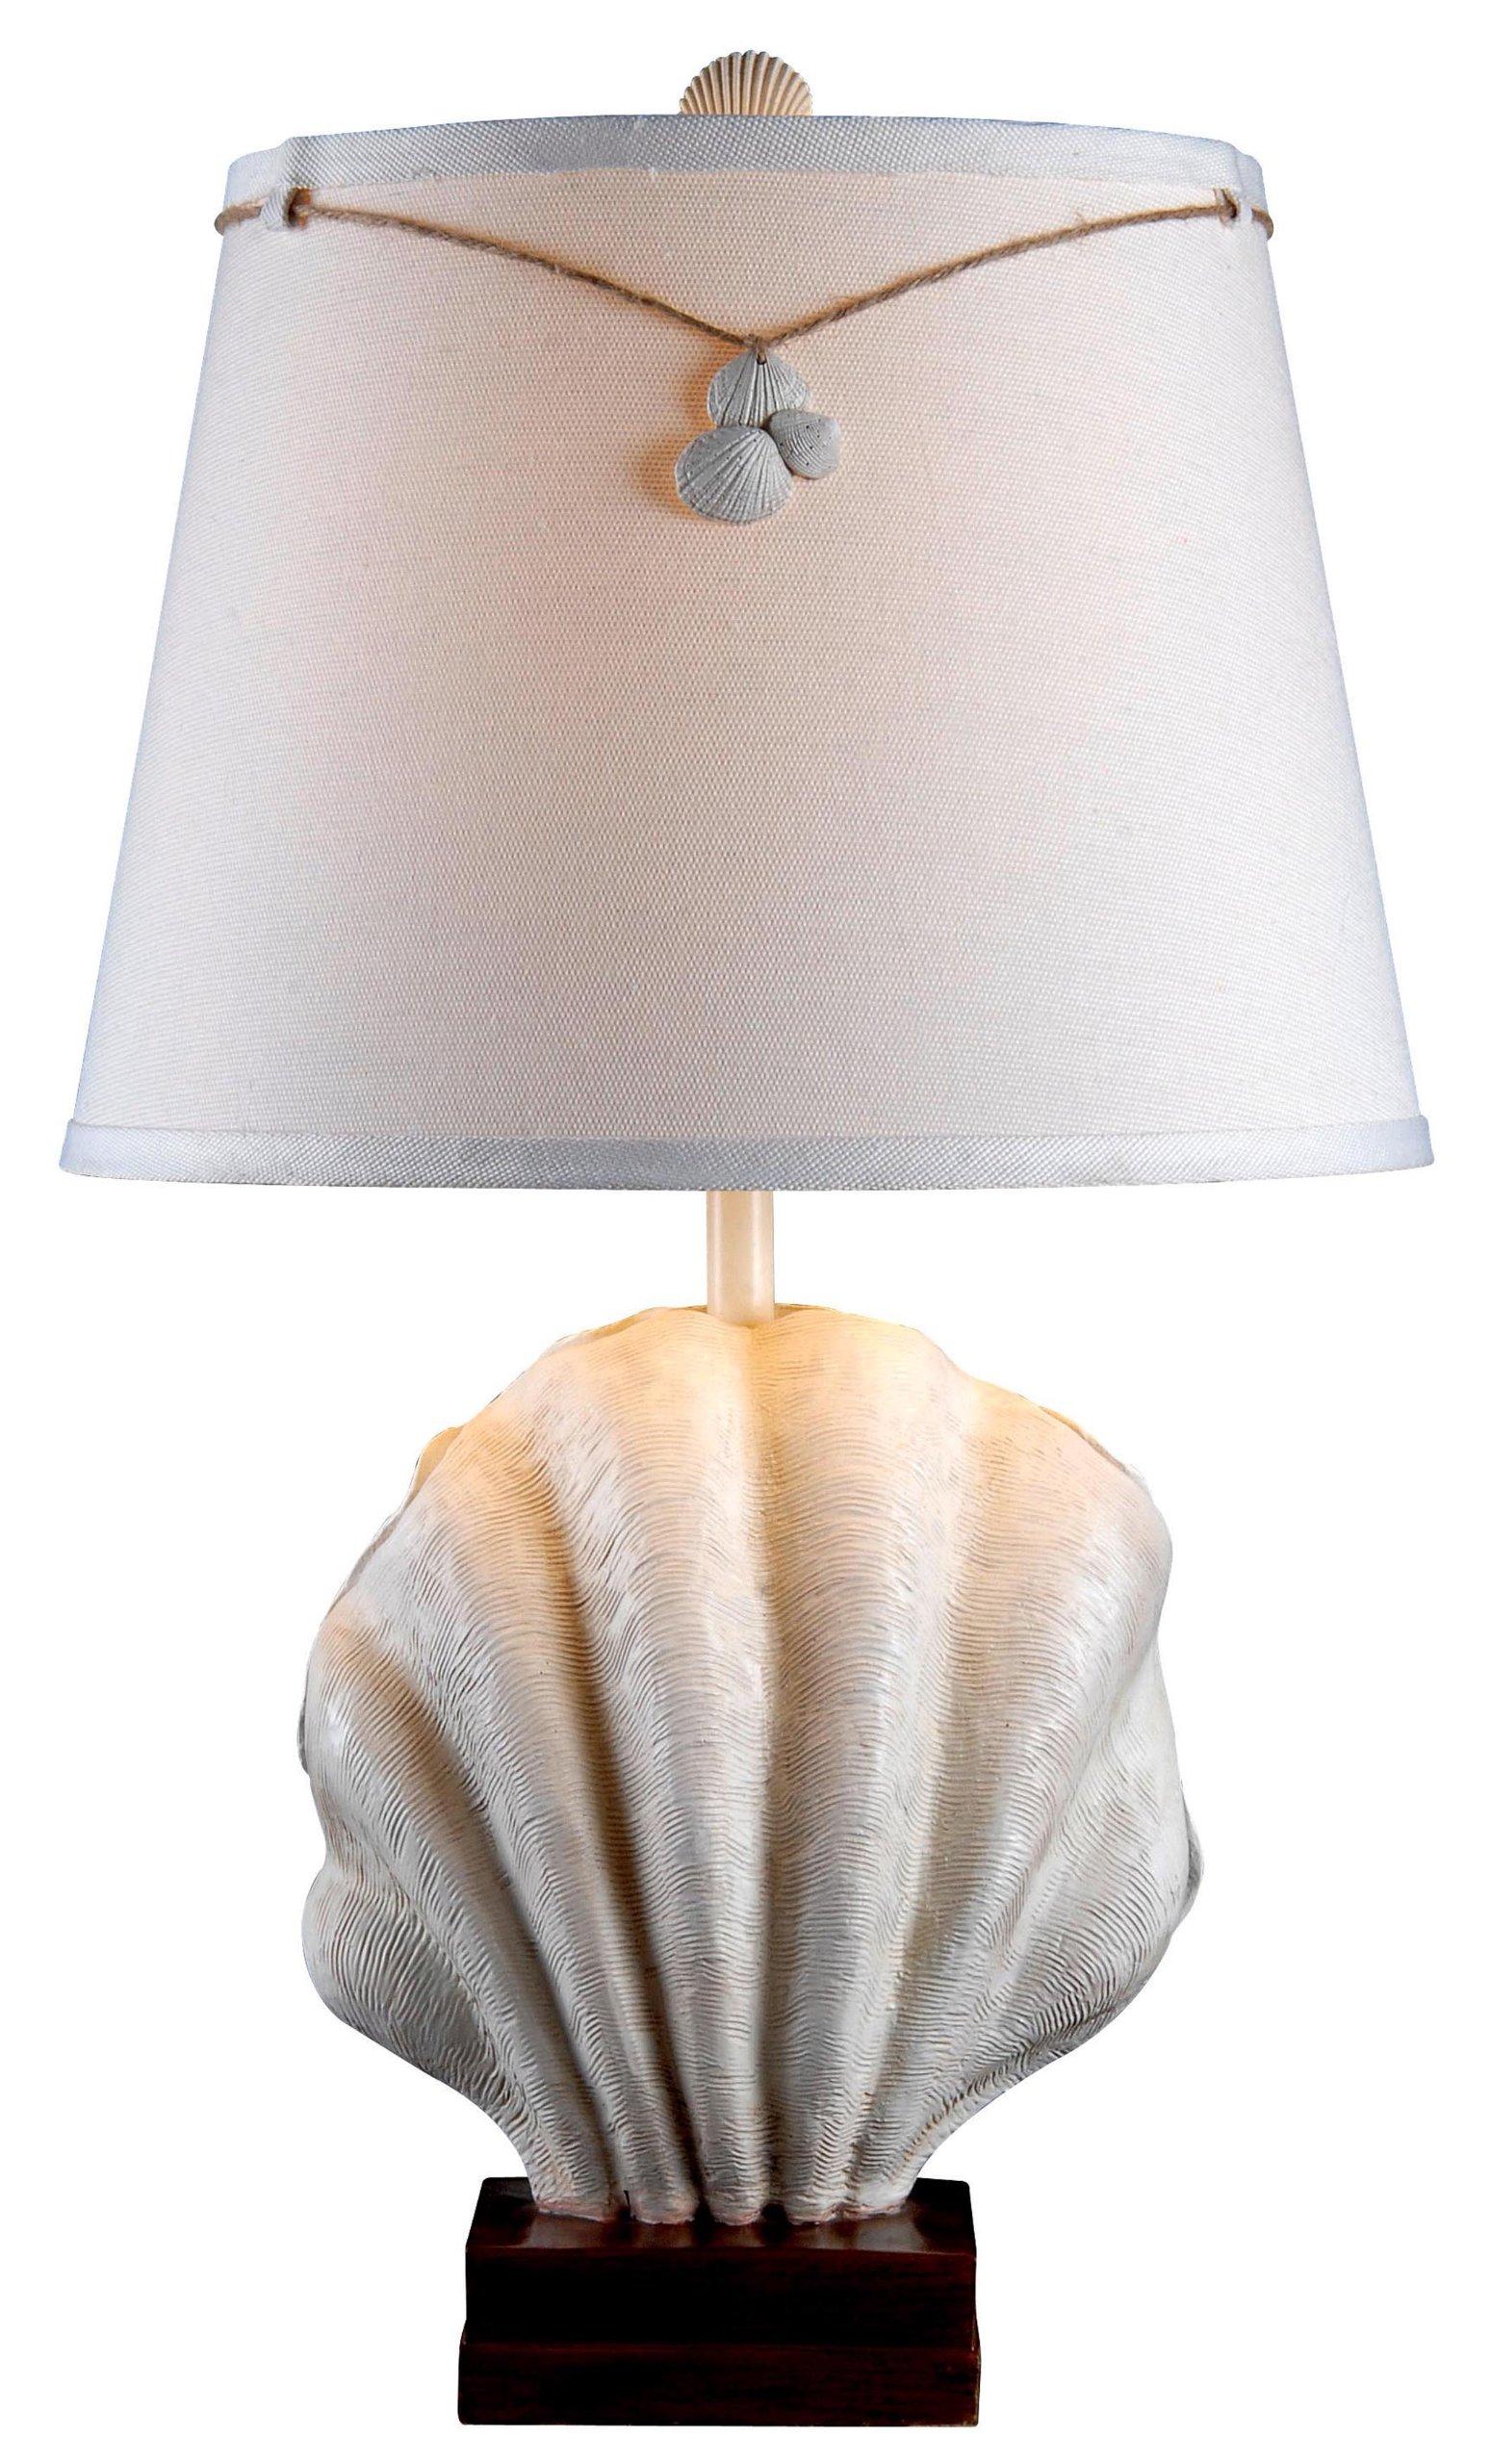 Kenroy Home 32268AWH Islander Table Lamp, Antique White Finish